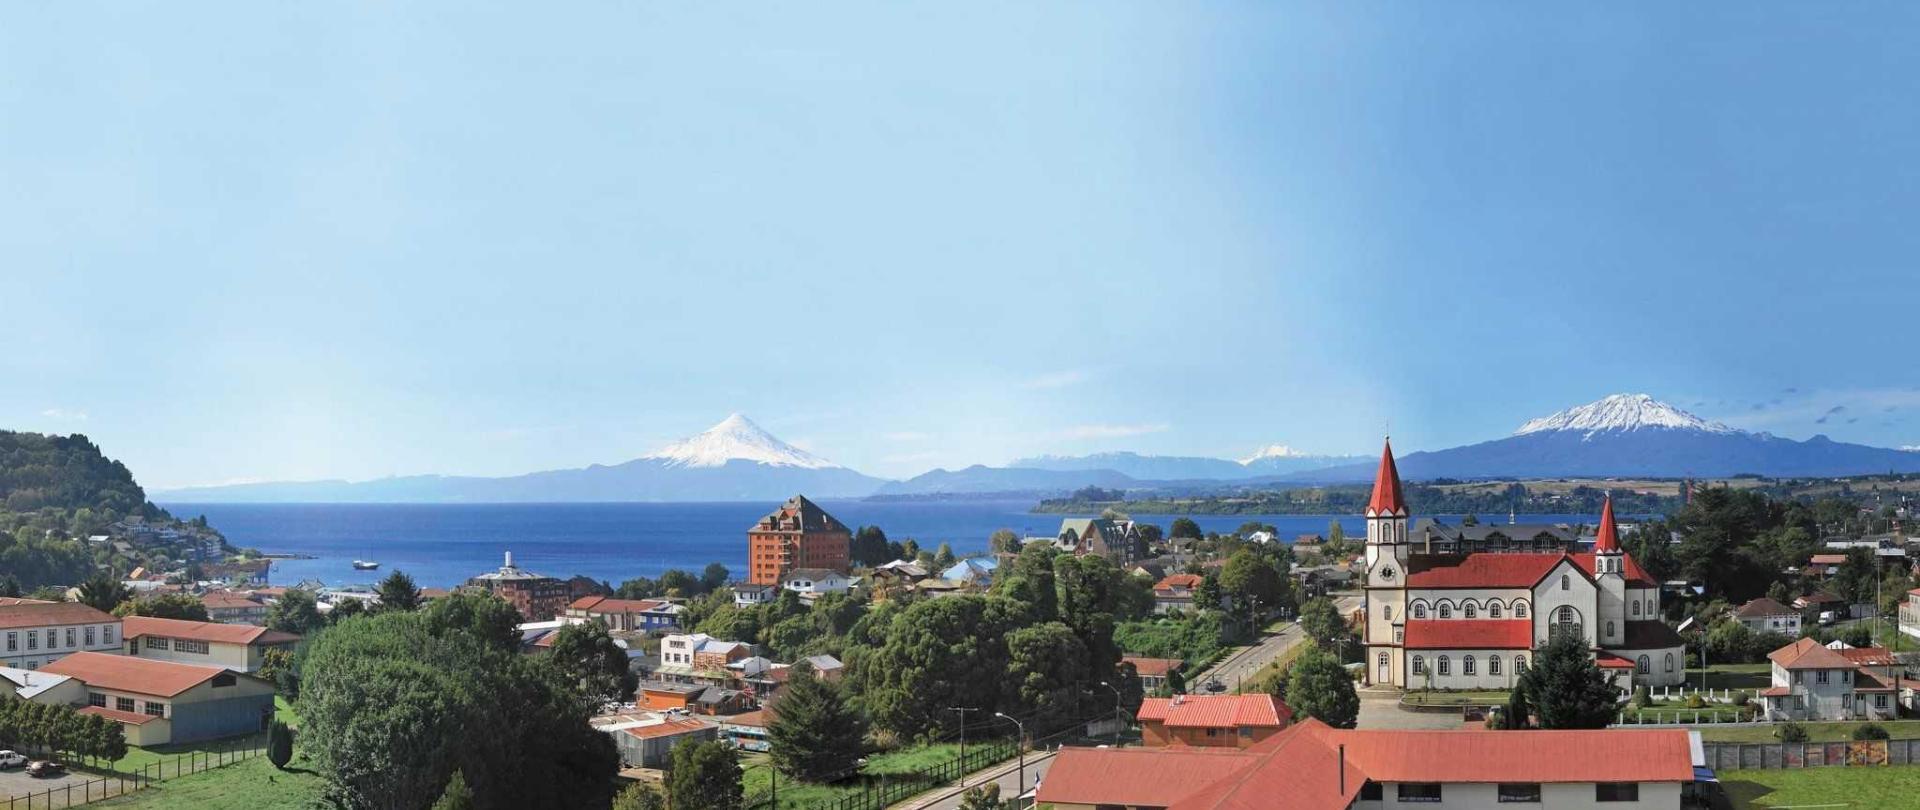 panoramica-de-puerto-varas-1.jpg